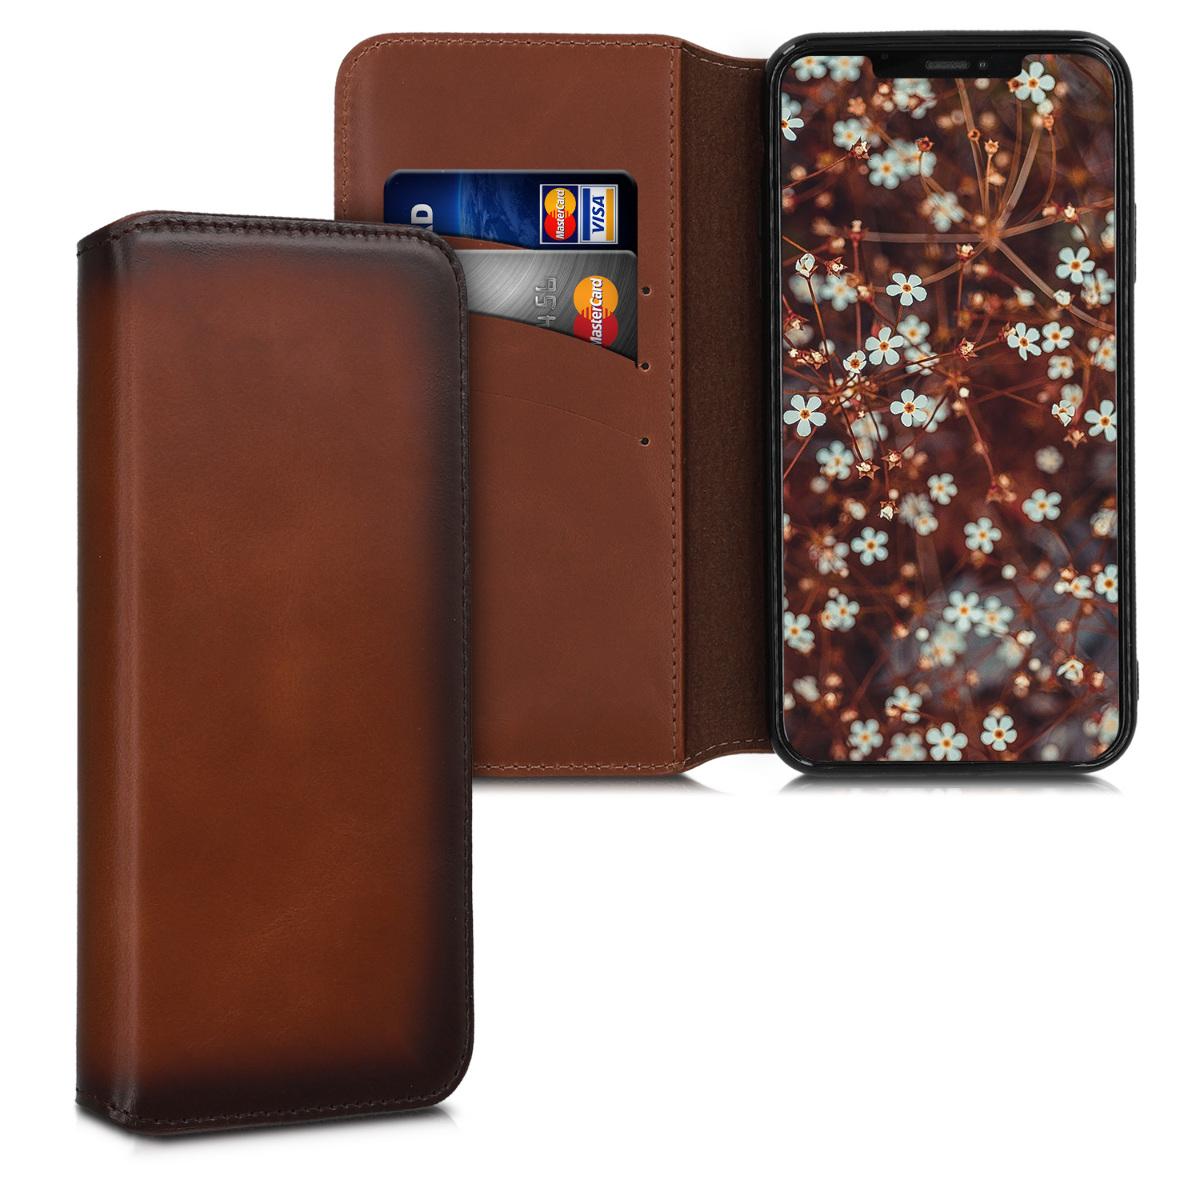 Kalibri Δερμάτινη Θήκη - Πορτοφόλι iPhone 11 Pro Max - Vintage Brown (49809.133)